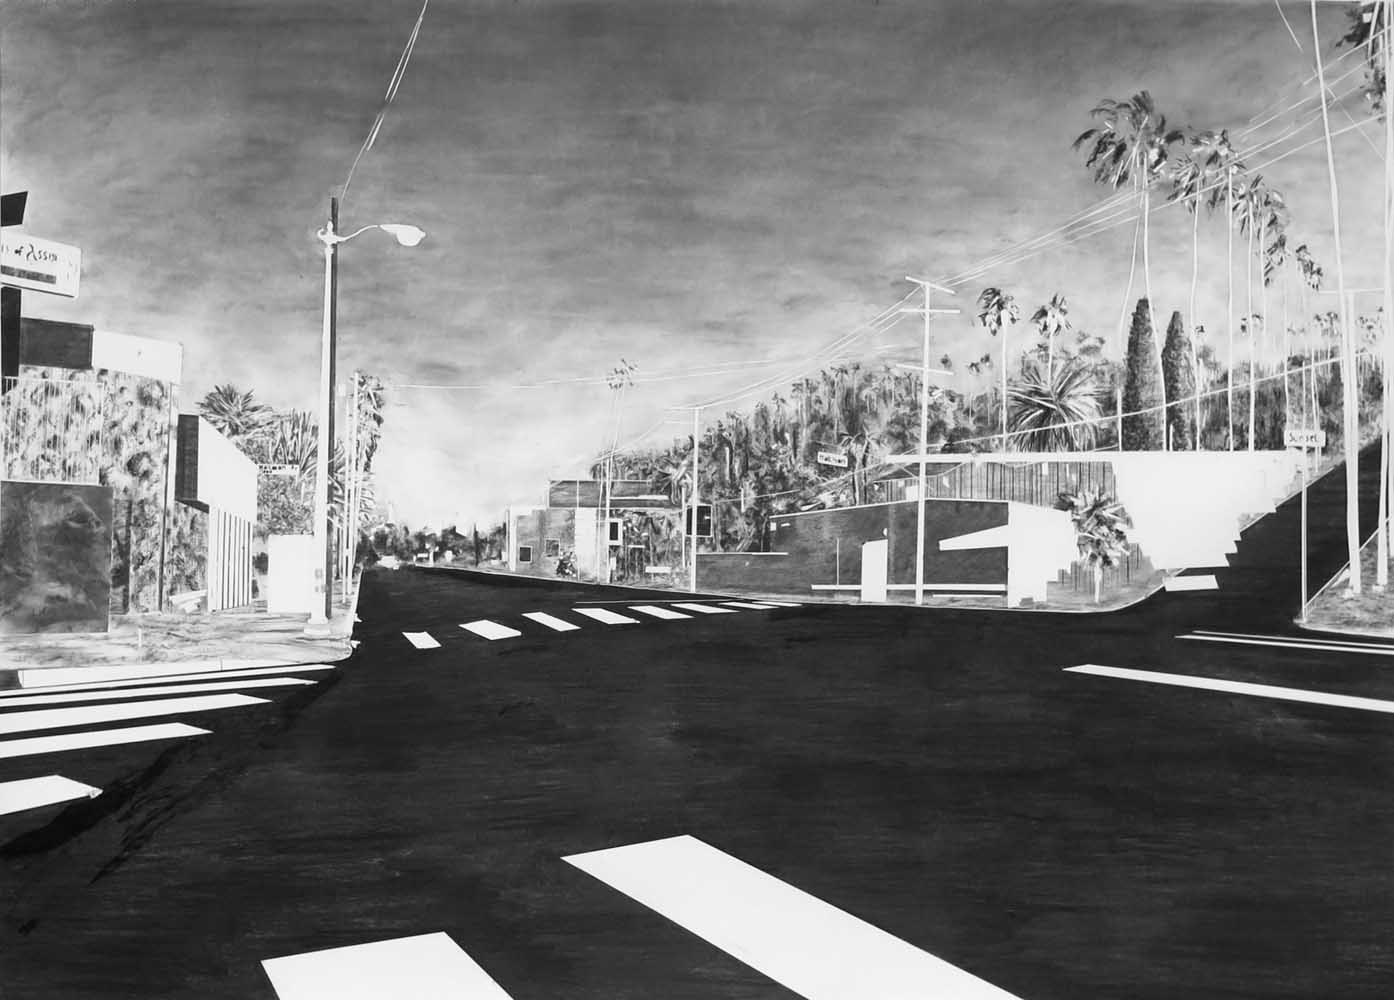 <em>Sunset Bvd / Maltman Ave</em>, 2014 <br>fusain <br>280 x 190 cm